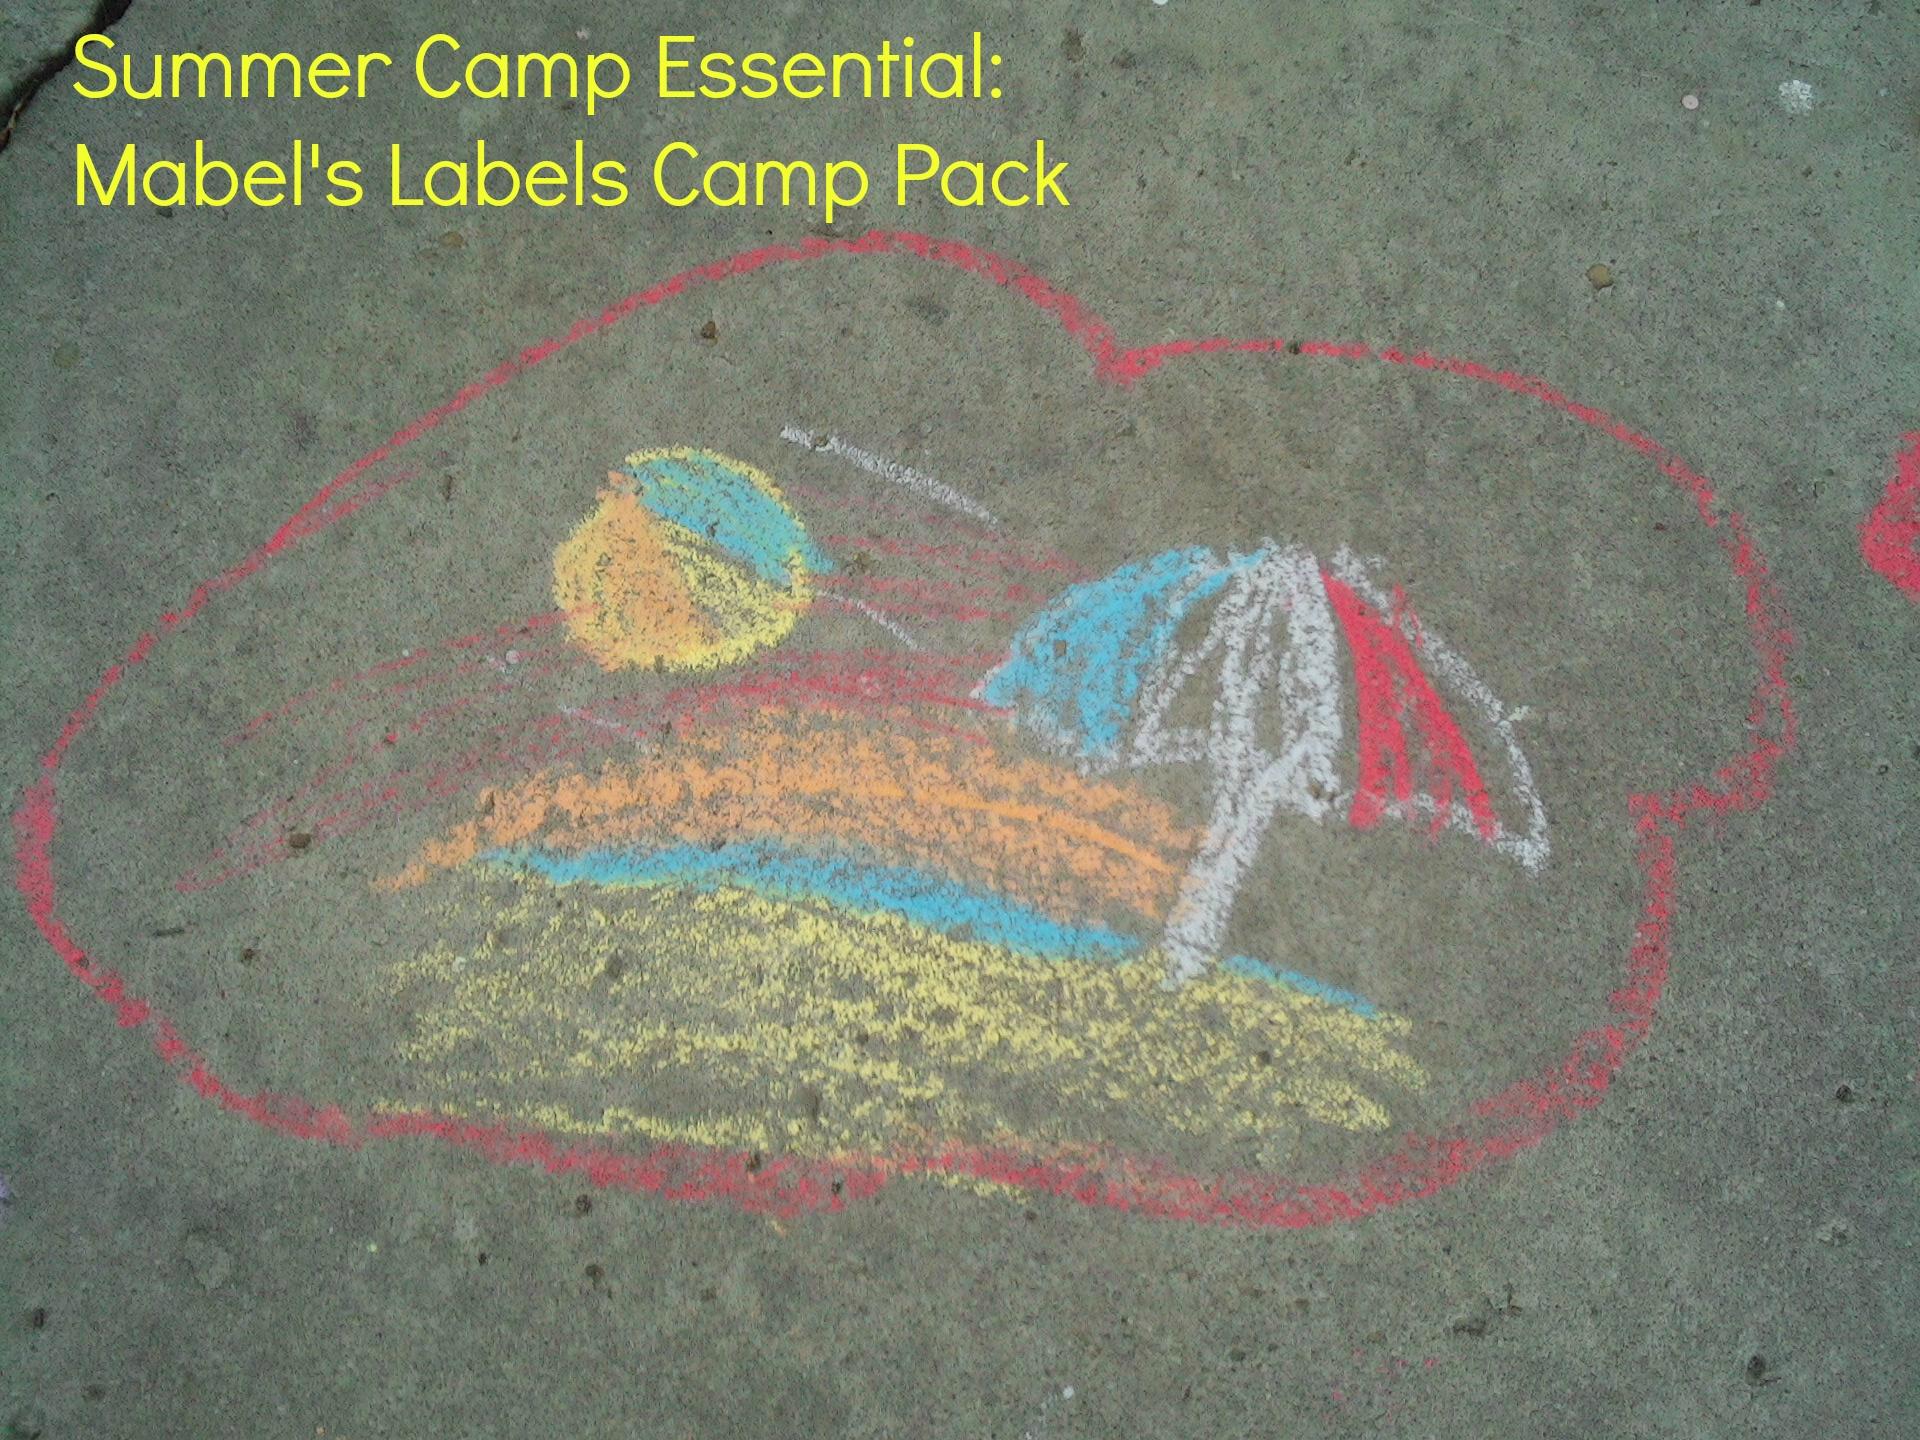 Summer Camp Essential for Kids | Mabel's Labels Camp Pack